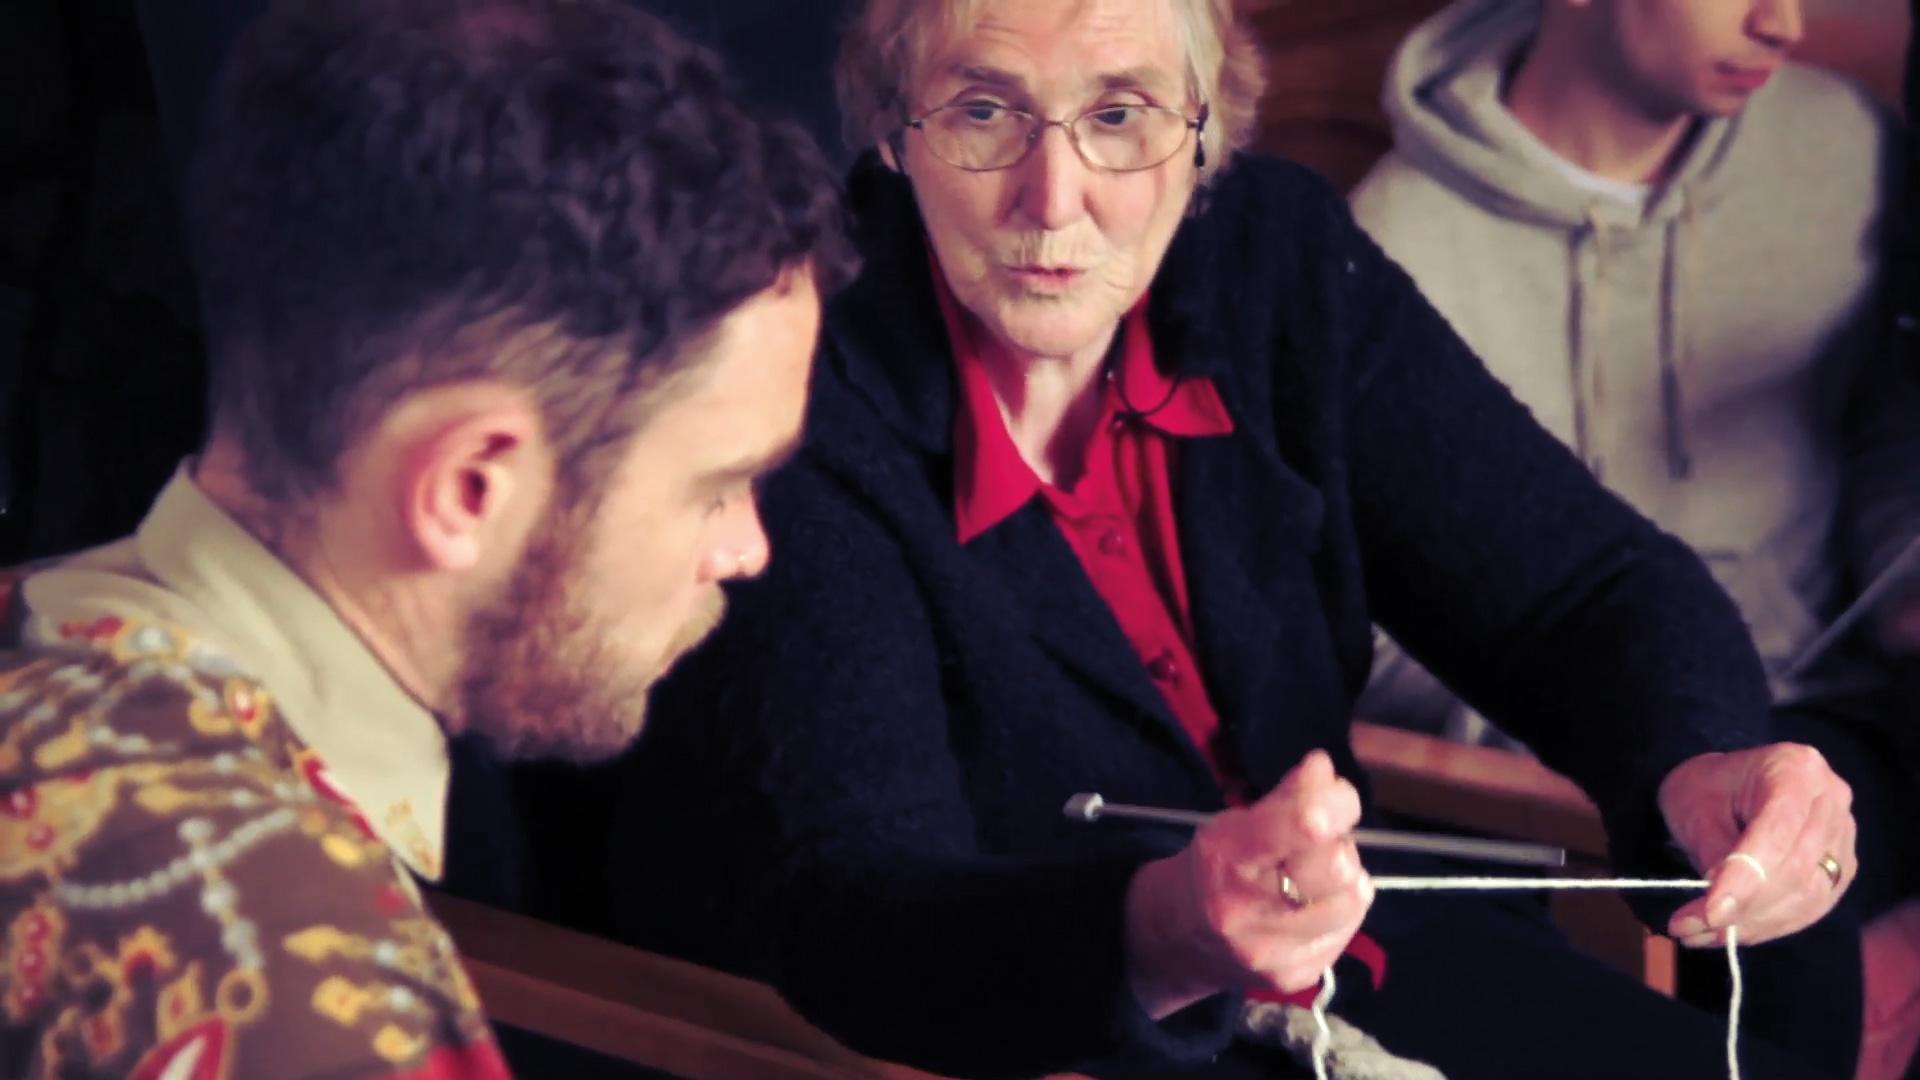 Still from Ishka Films documentation of DE14, showing Maireád Uí Fhlátharta's knitting workshop